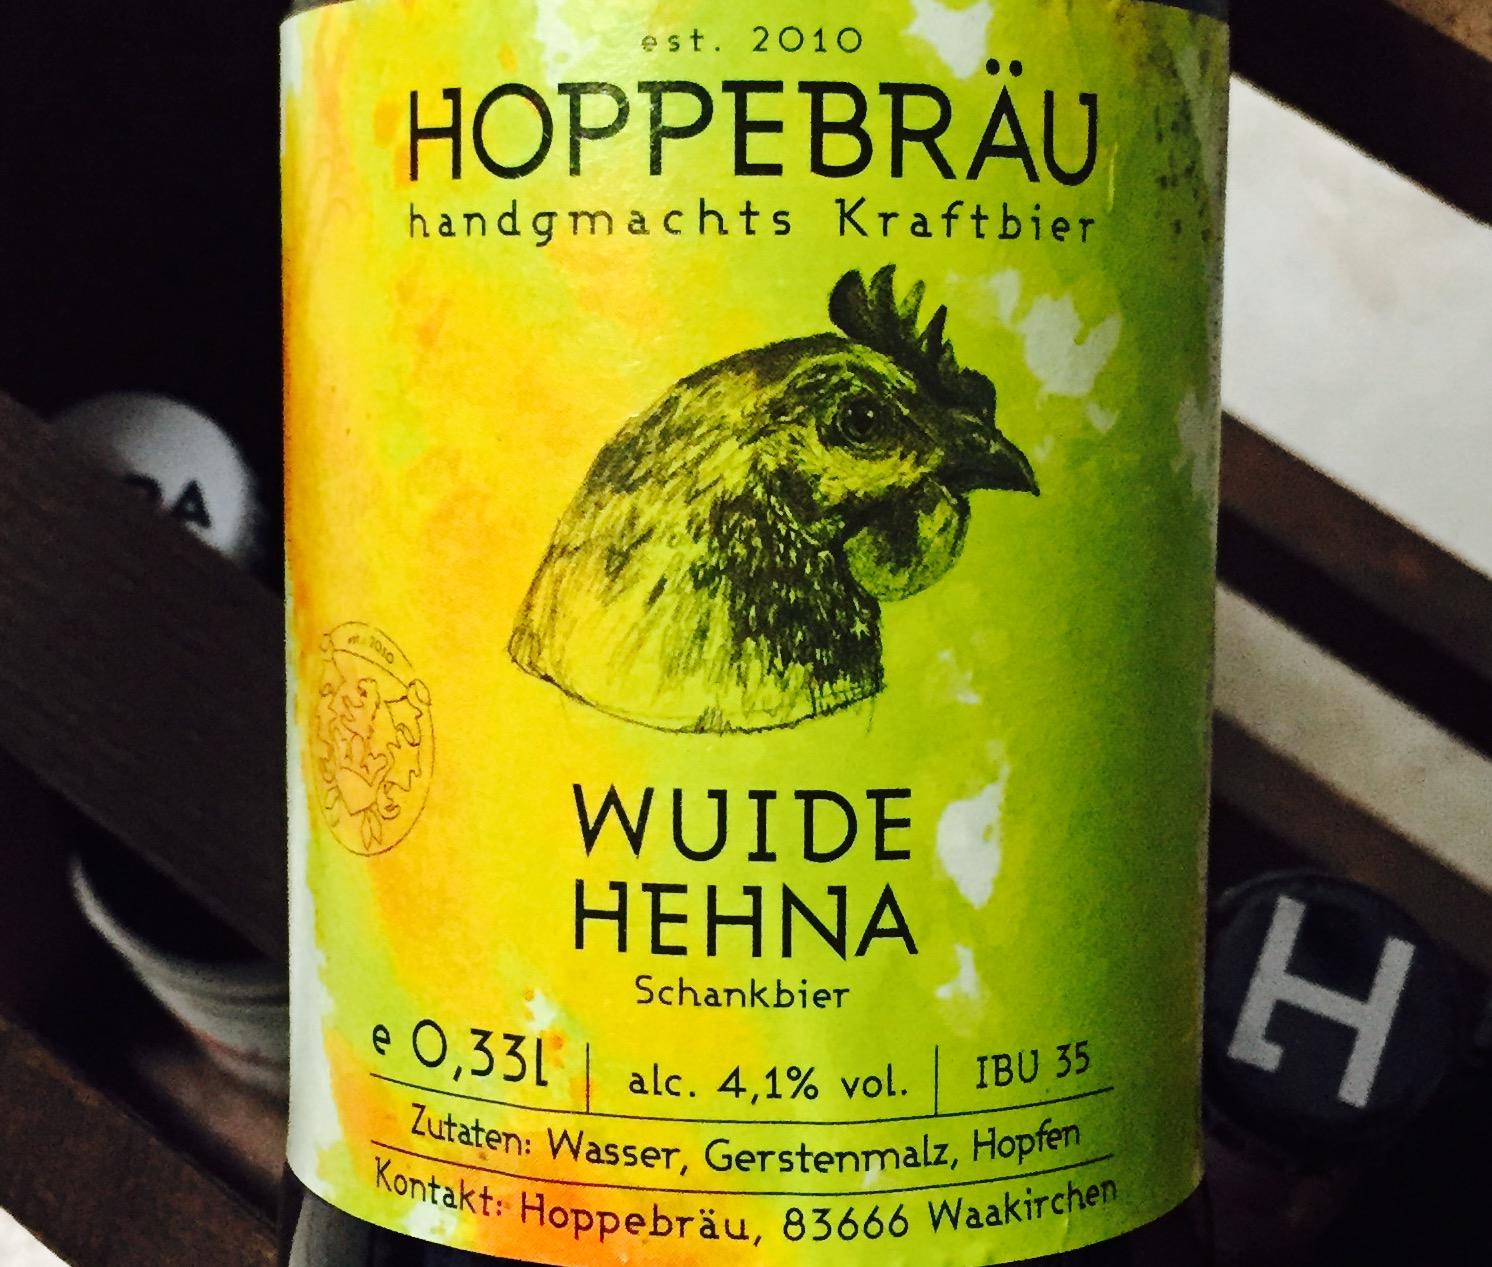 Hoppebräu - Wurde Hehna